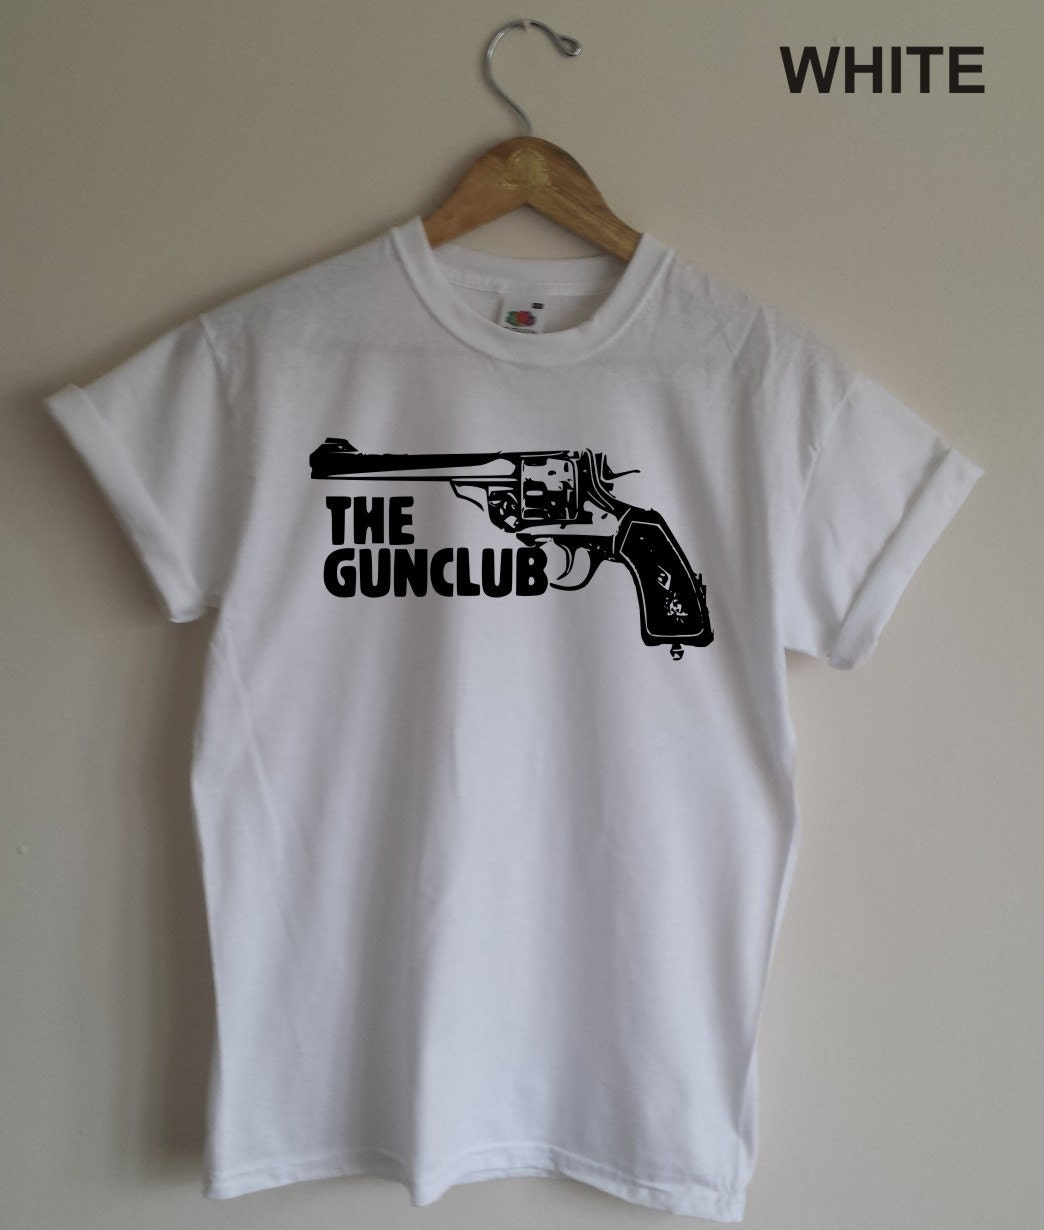 The Gun Club T Shirt Post Punkcowpunk Band All Sizes And